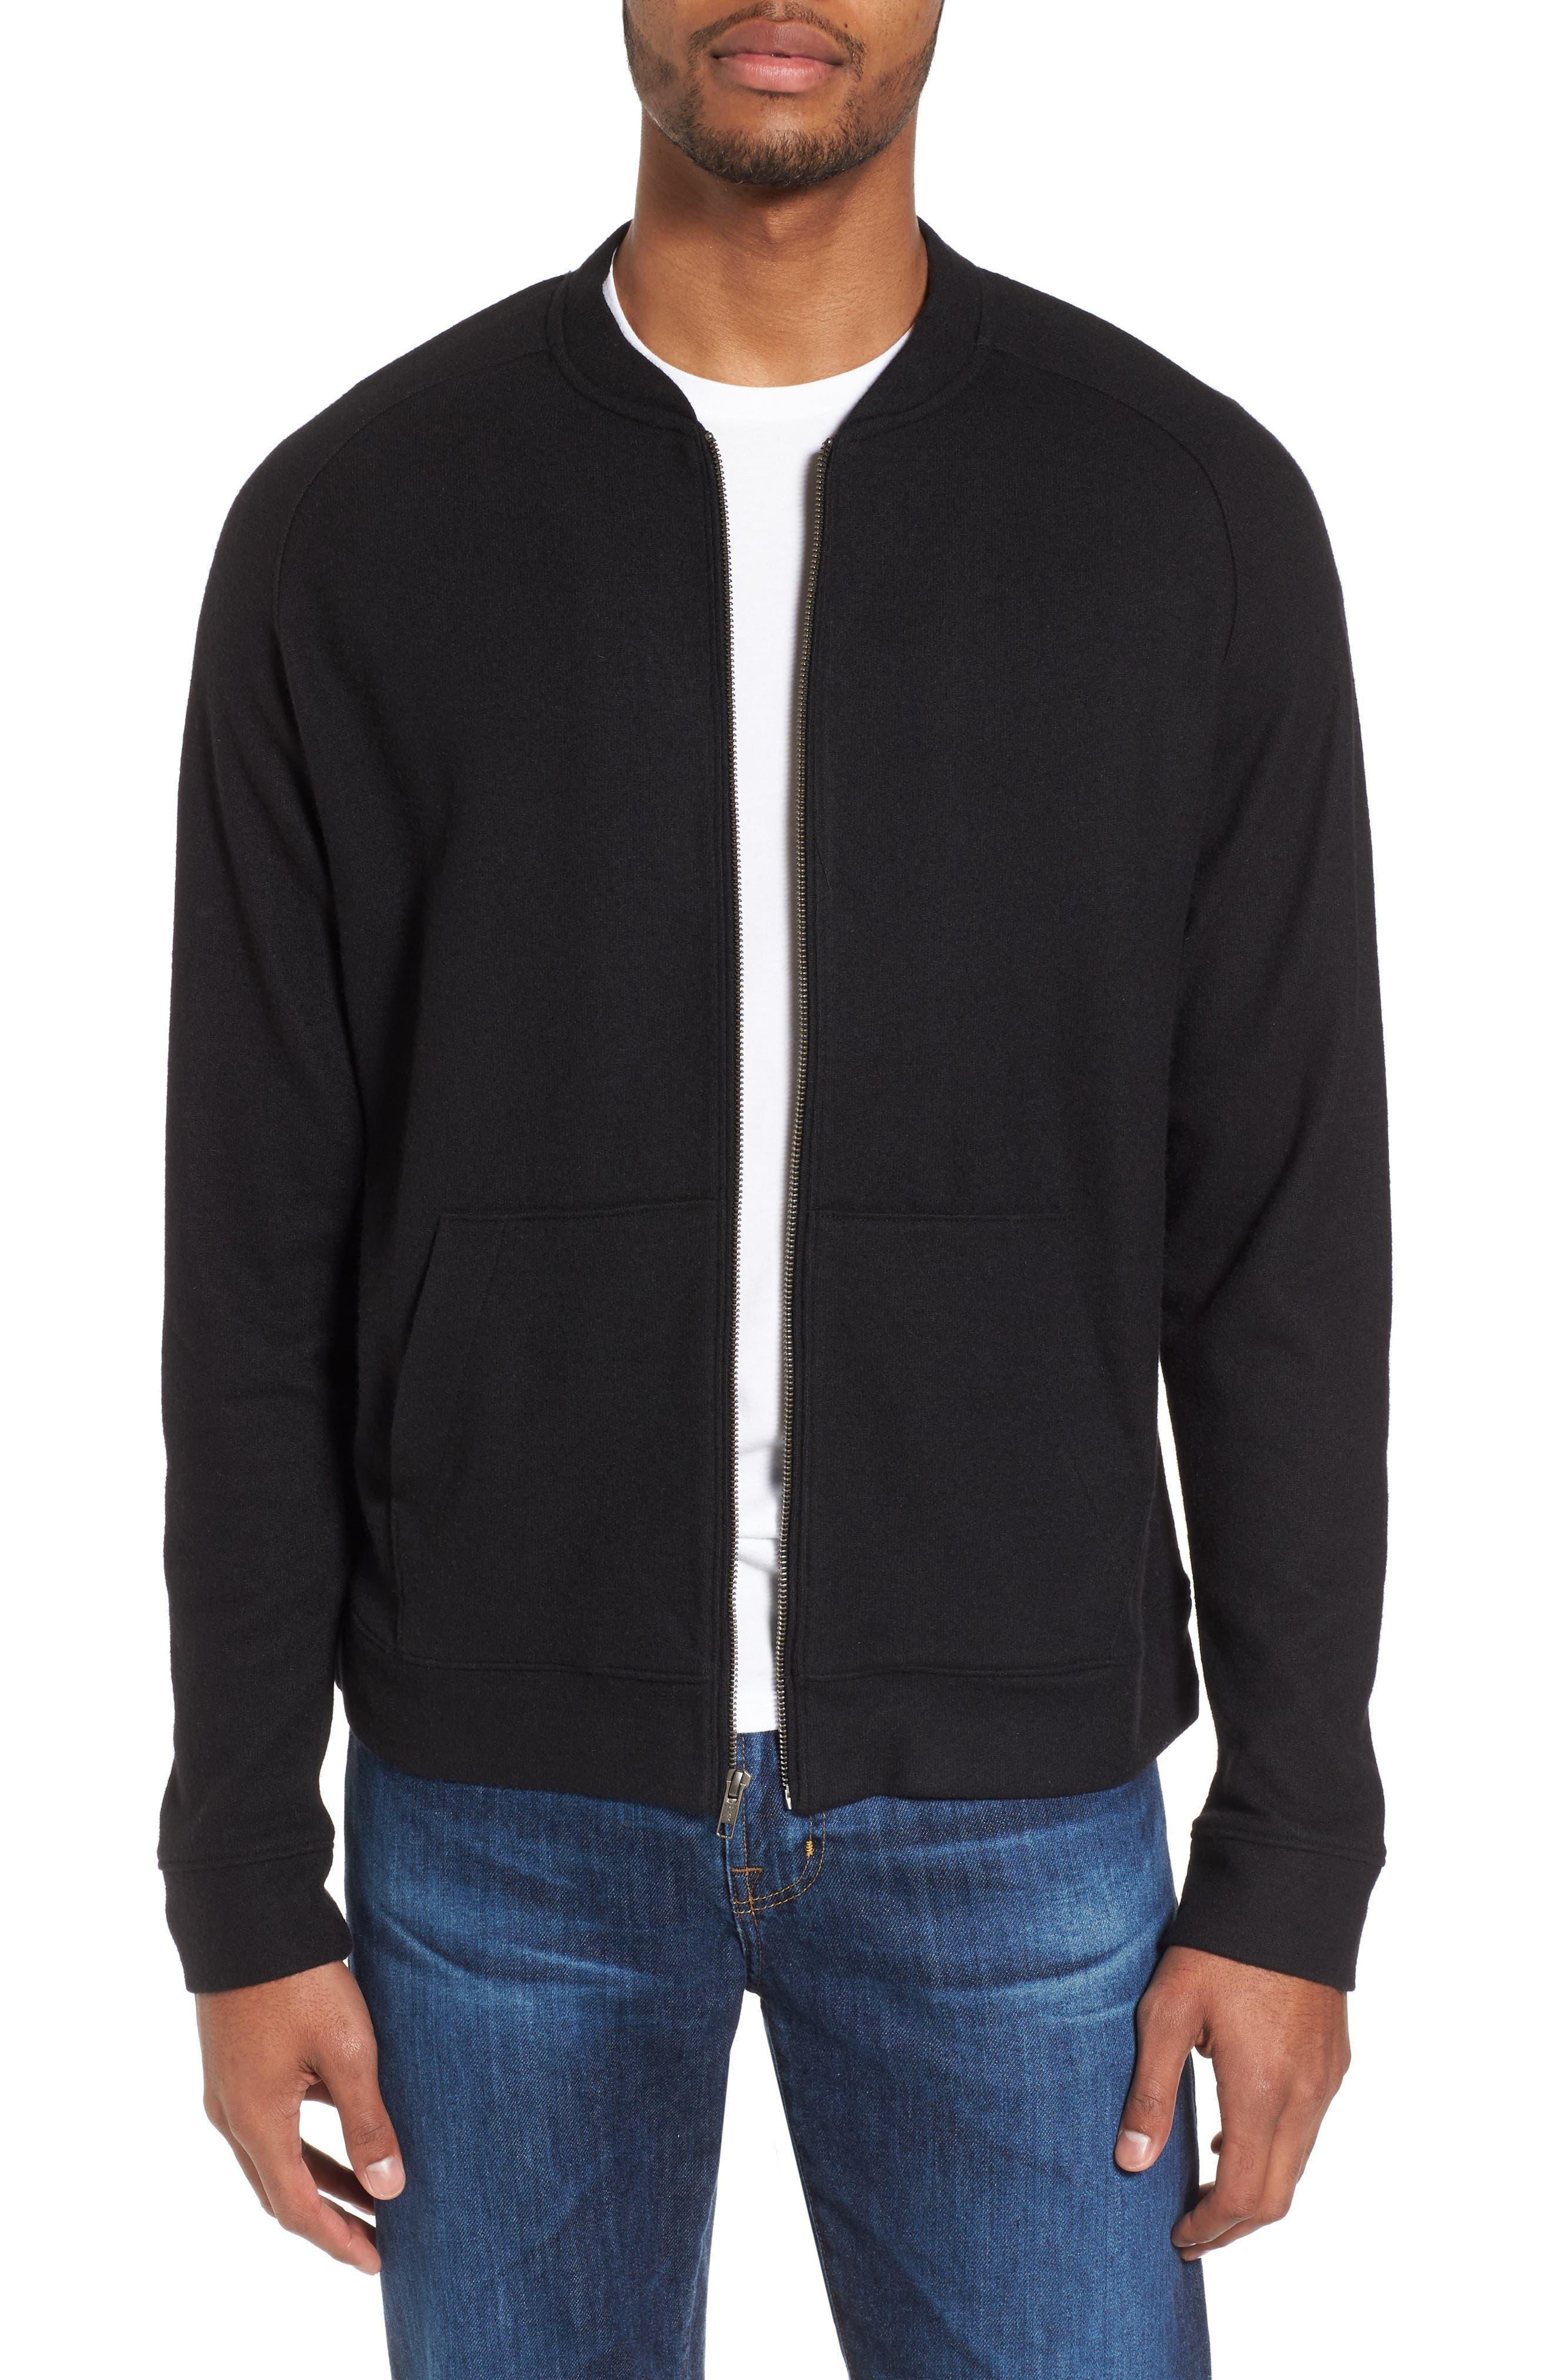 Nordstrom Men's Shop Wool Blend Fleece Bomber Jacket